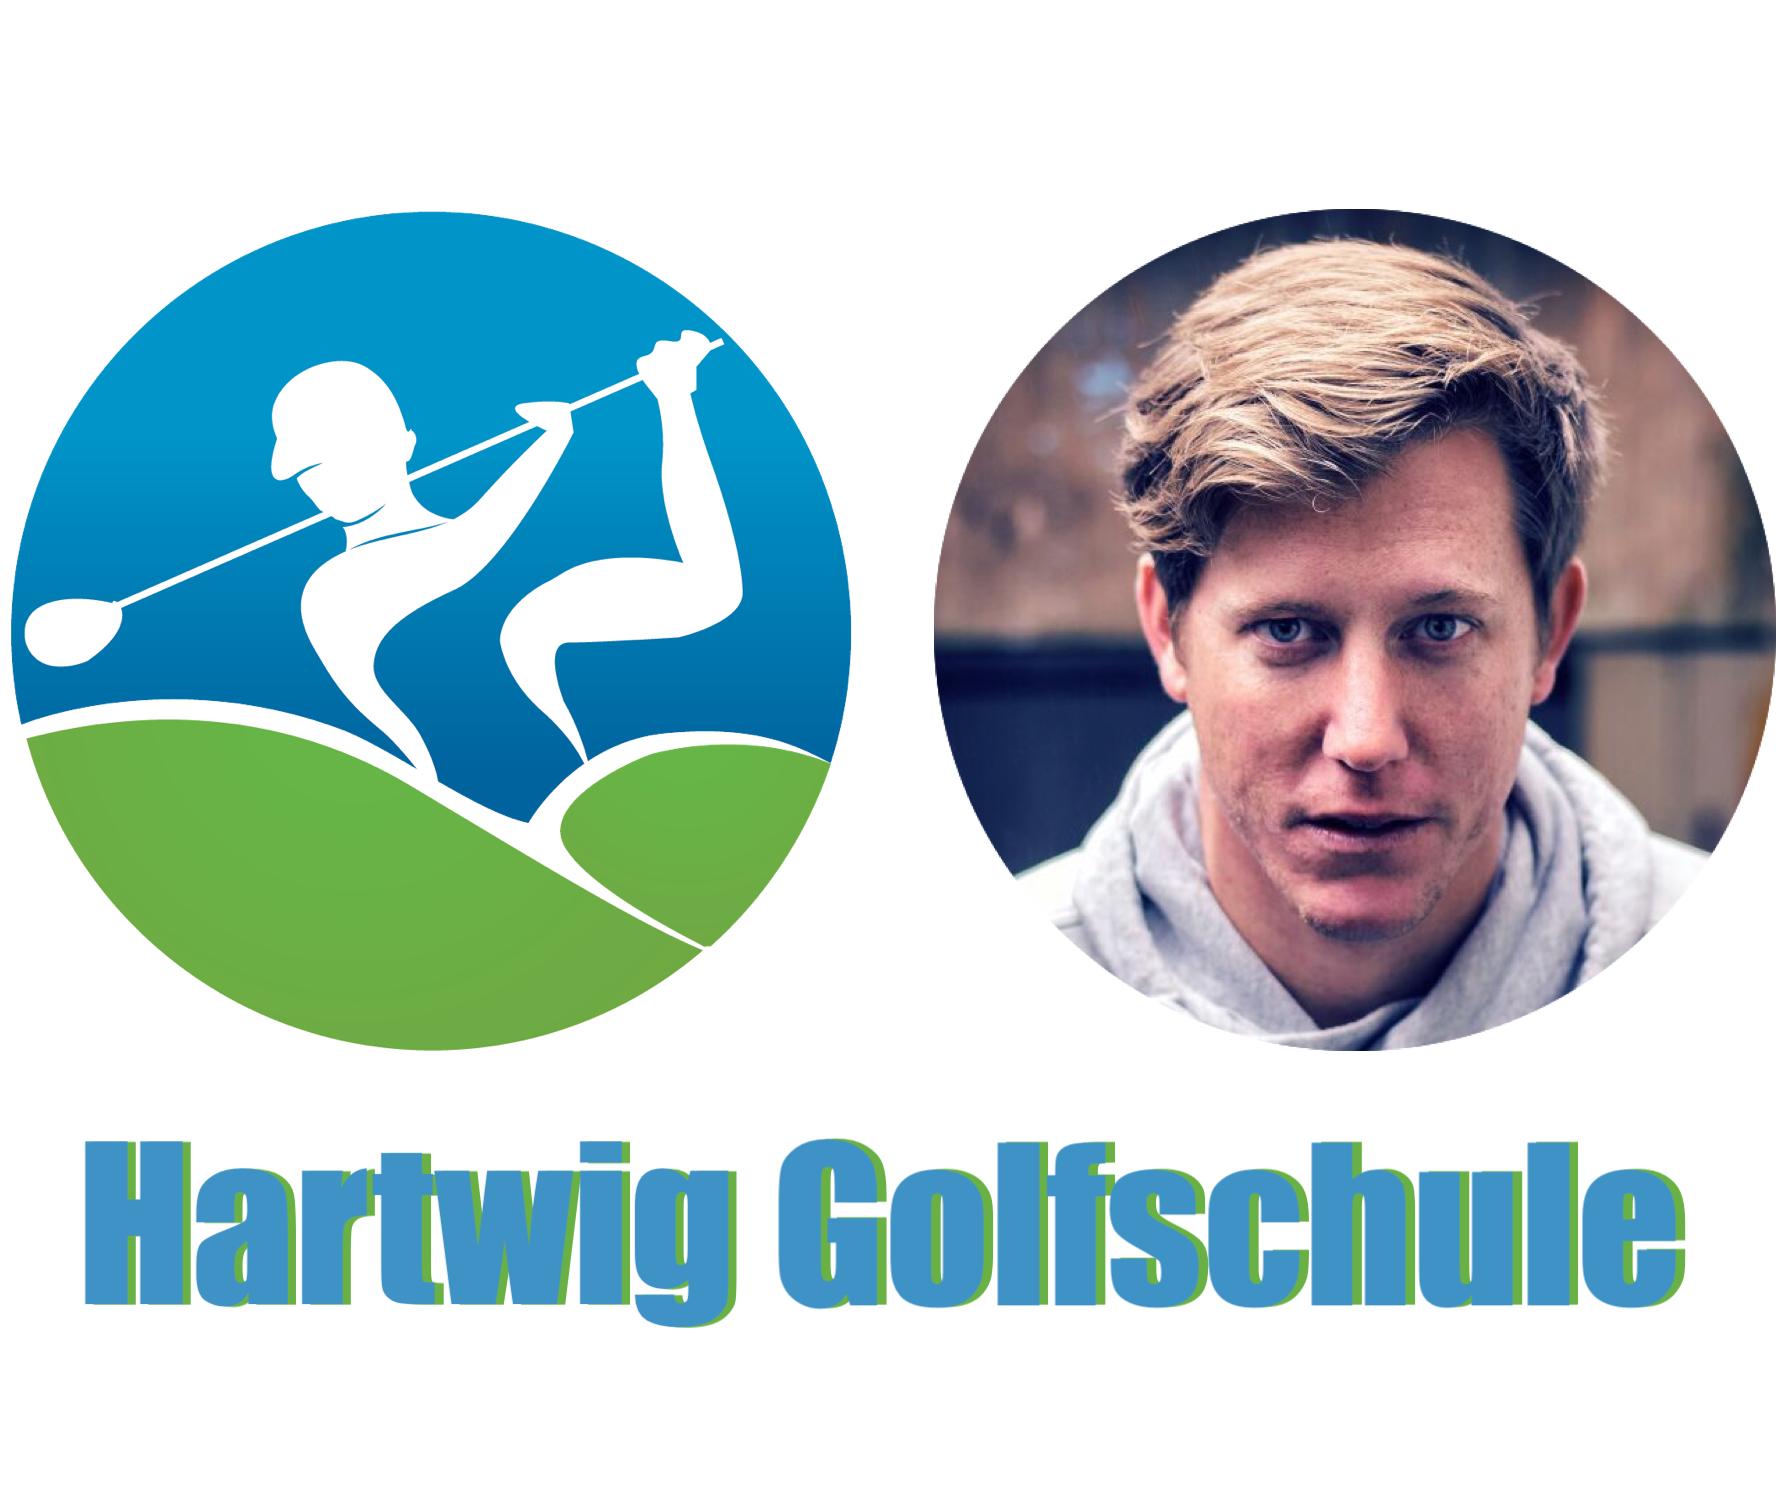 Hartwig Golfschule jpg